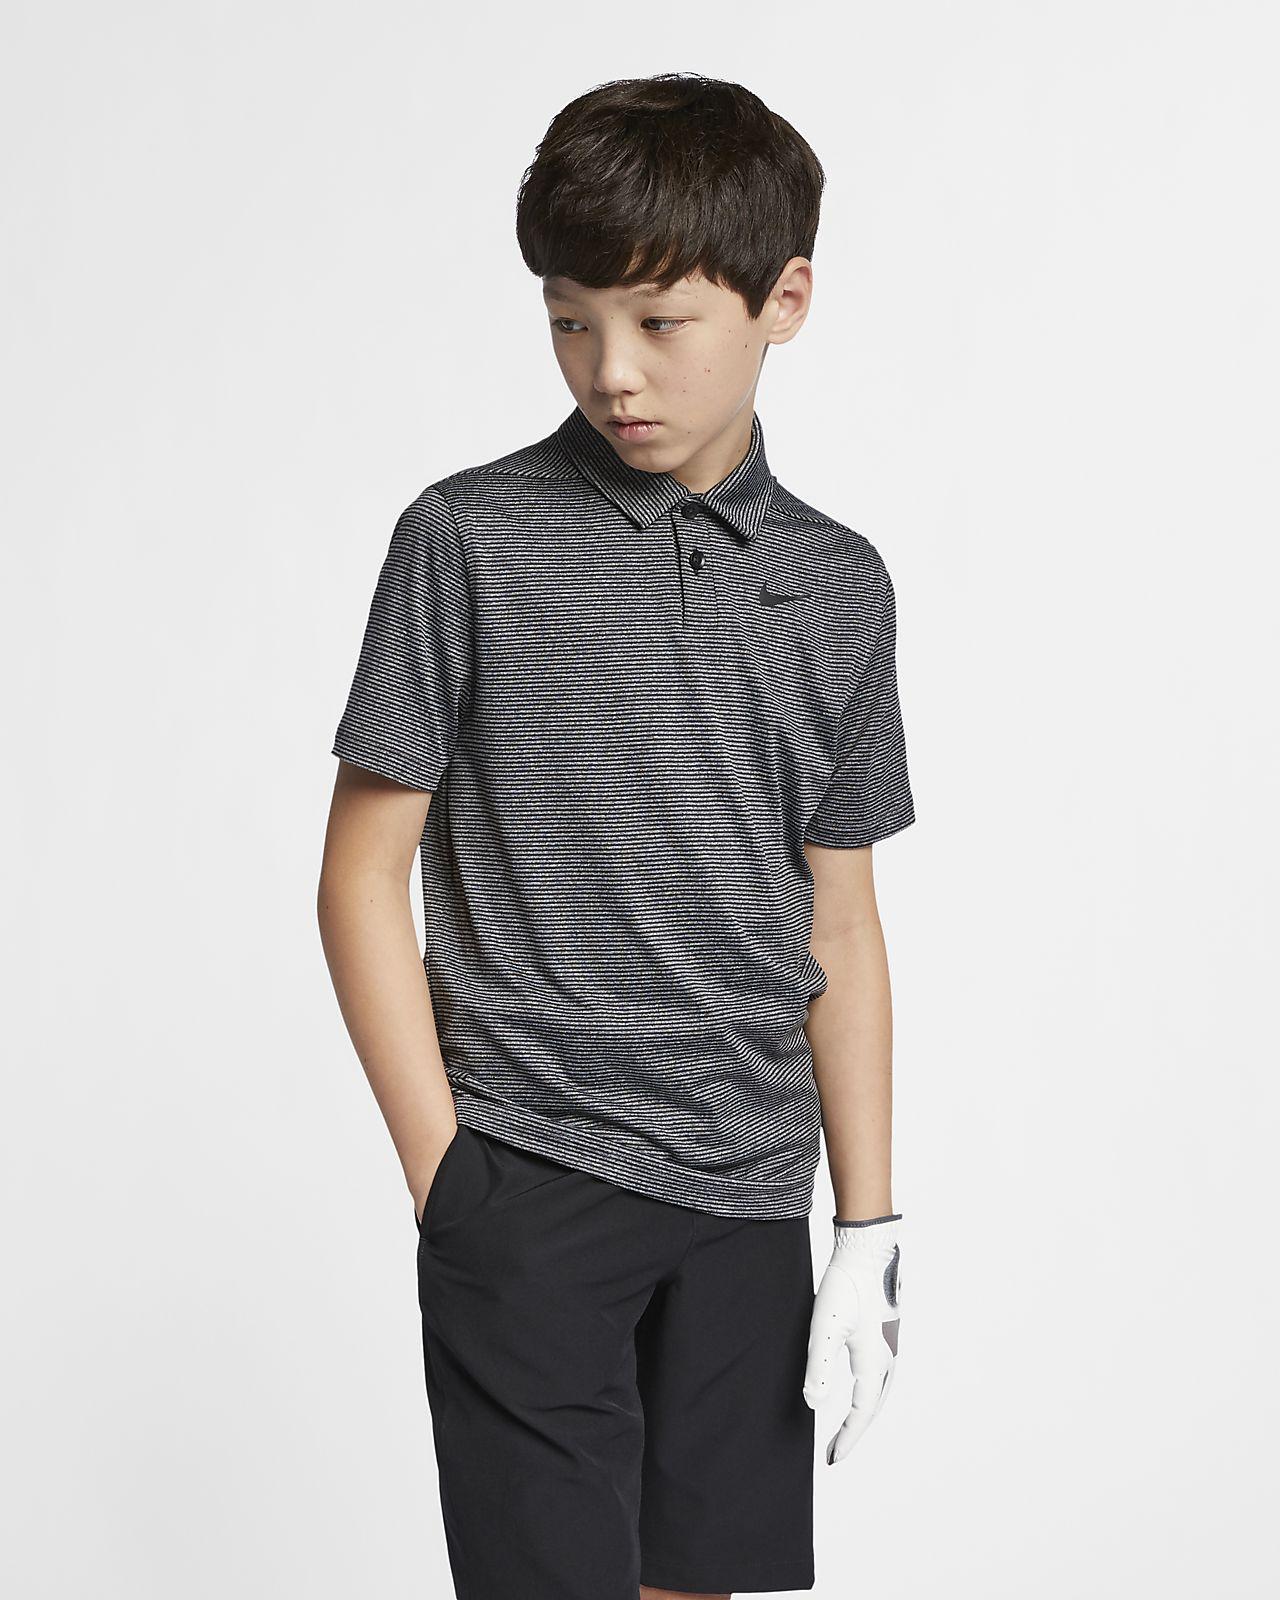 Nike Dri-FIT Polo a ratlles de golf - Nen